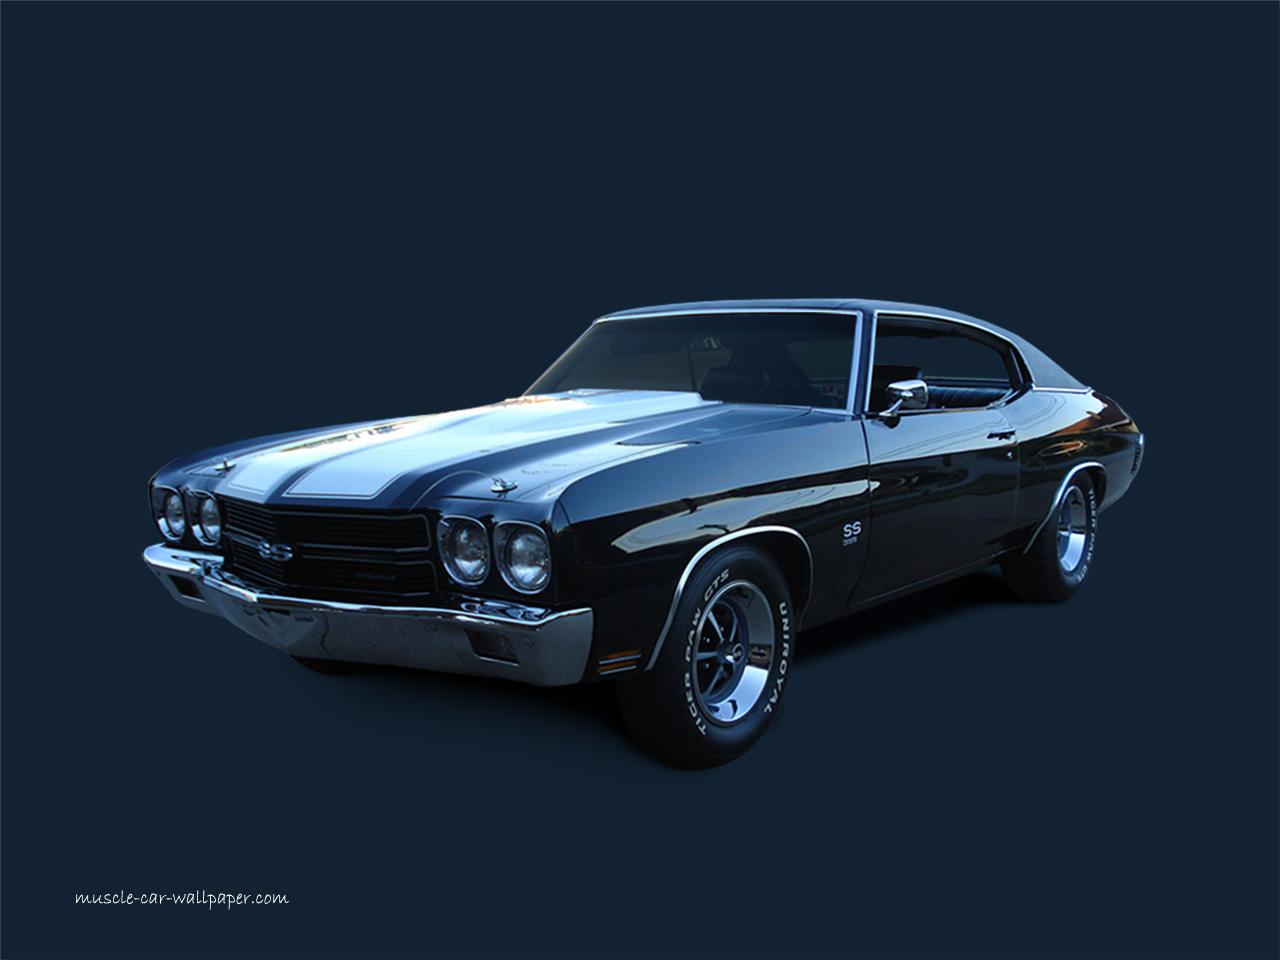 1970 chevelle ss wallpaper blue coupe 1280 02 trivia the 1970 chevelle 1280x960